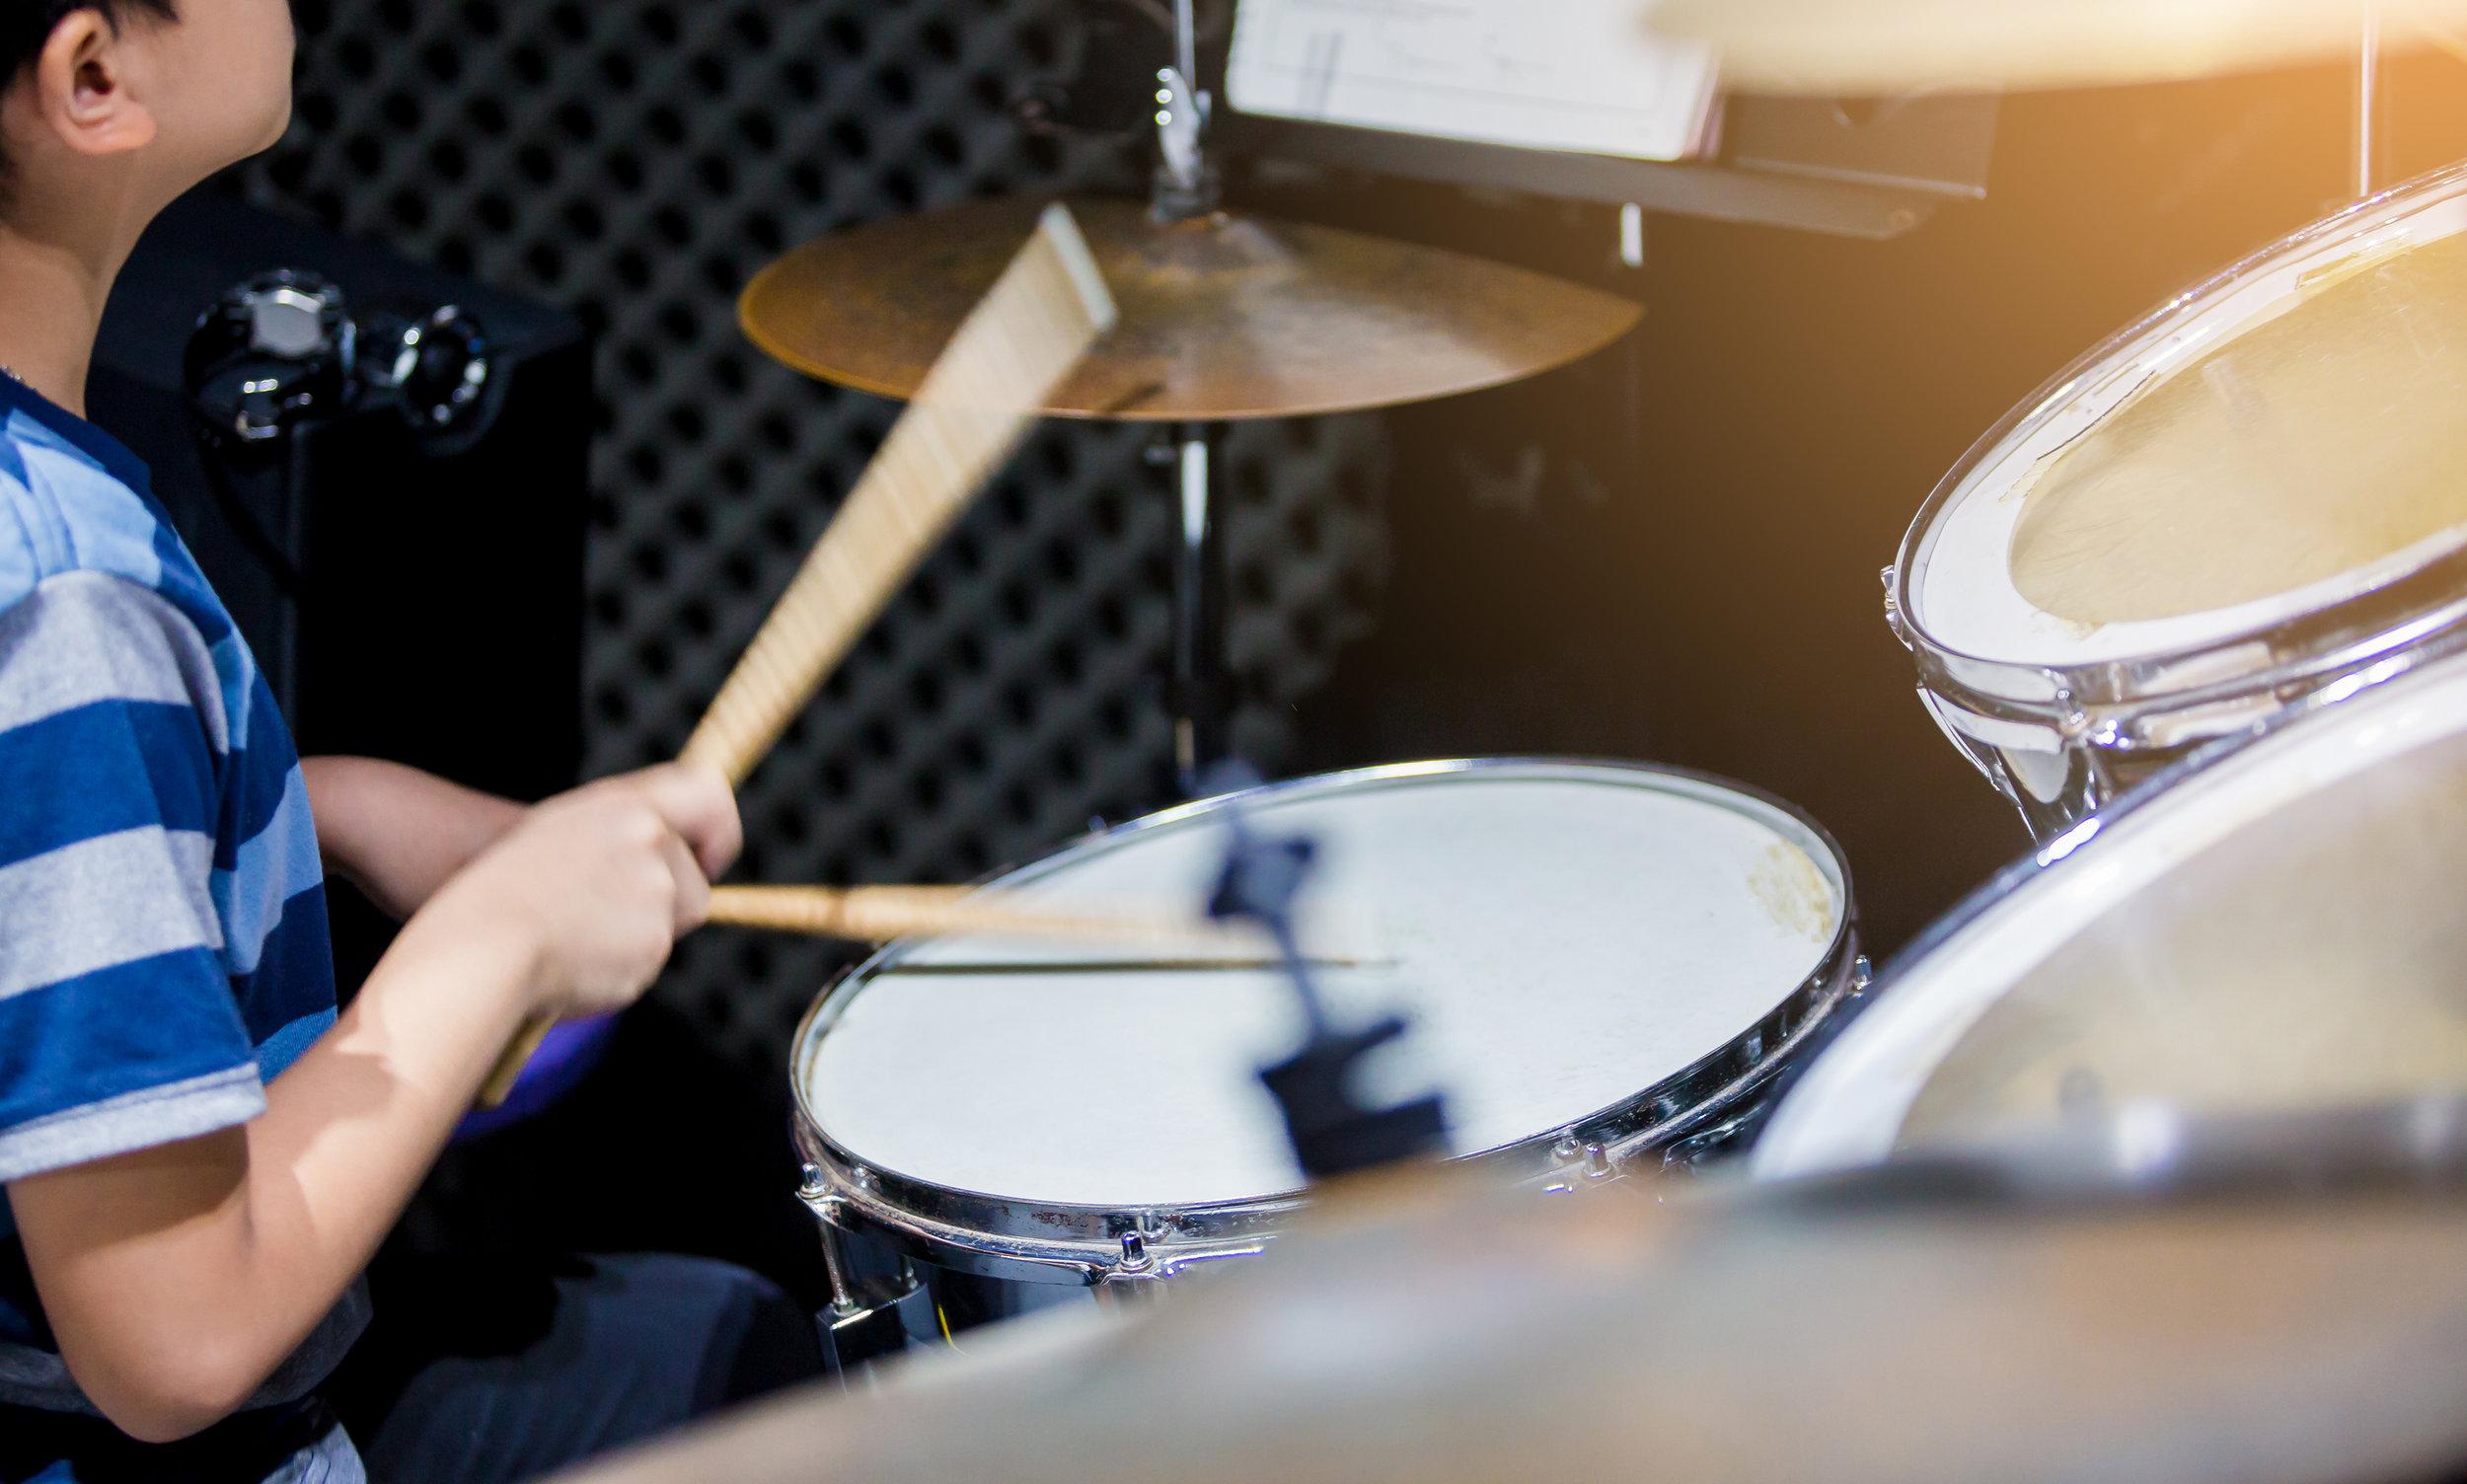 bigstock-Blurry-Image-Of-Wooden-Drumsti-291437872.jpg